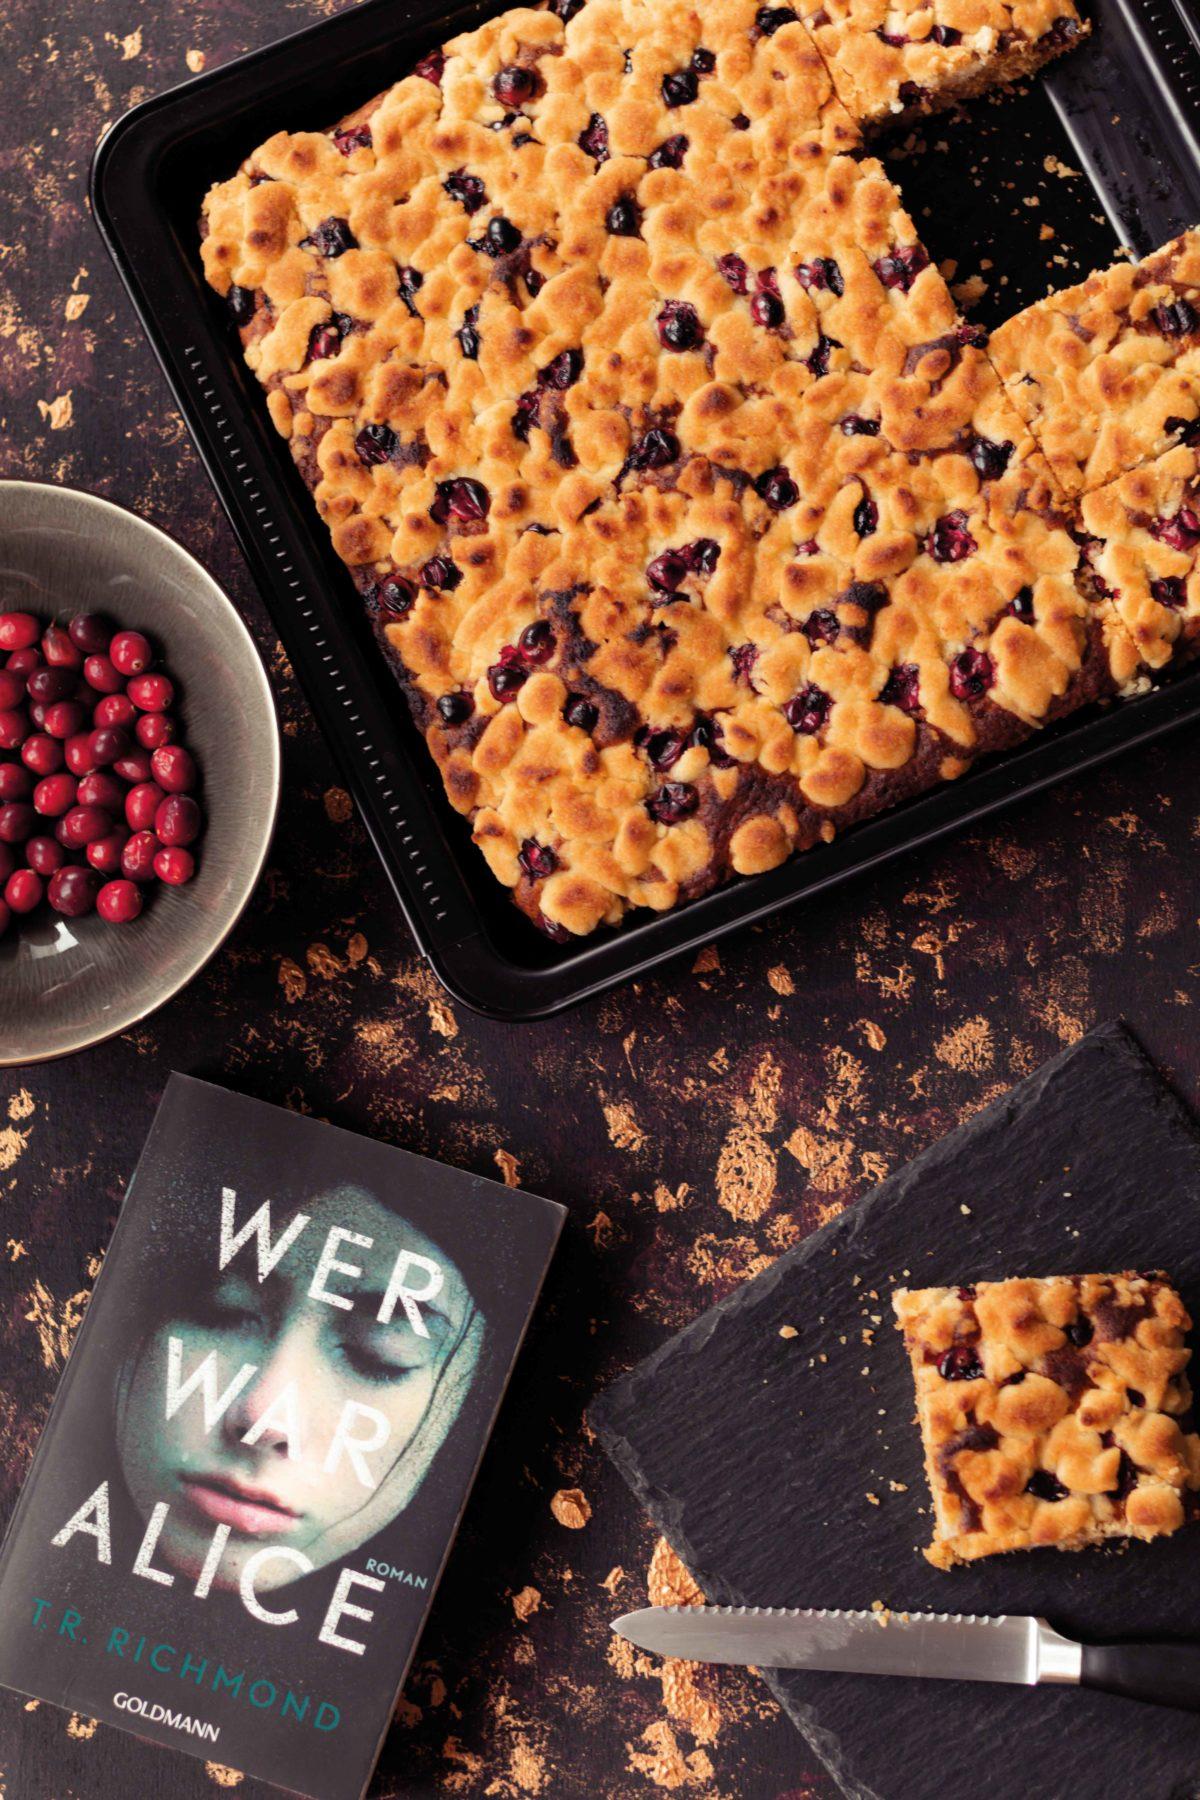 Cranberry Streusel Kuchen // Cranberry Crumble Cake by http://babyrockmyday.com/cranberry-streusel-kuchen/ #cranberry #streuselkuchen #crumblecakeCranberry Streusel Kuchen // Cranberry Crumble Cake by http://babyrockmyday.com/cranberry-streusel-kuchen/ #cranberry #streuselkuchen #crumblecake